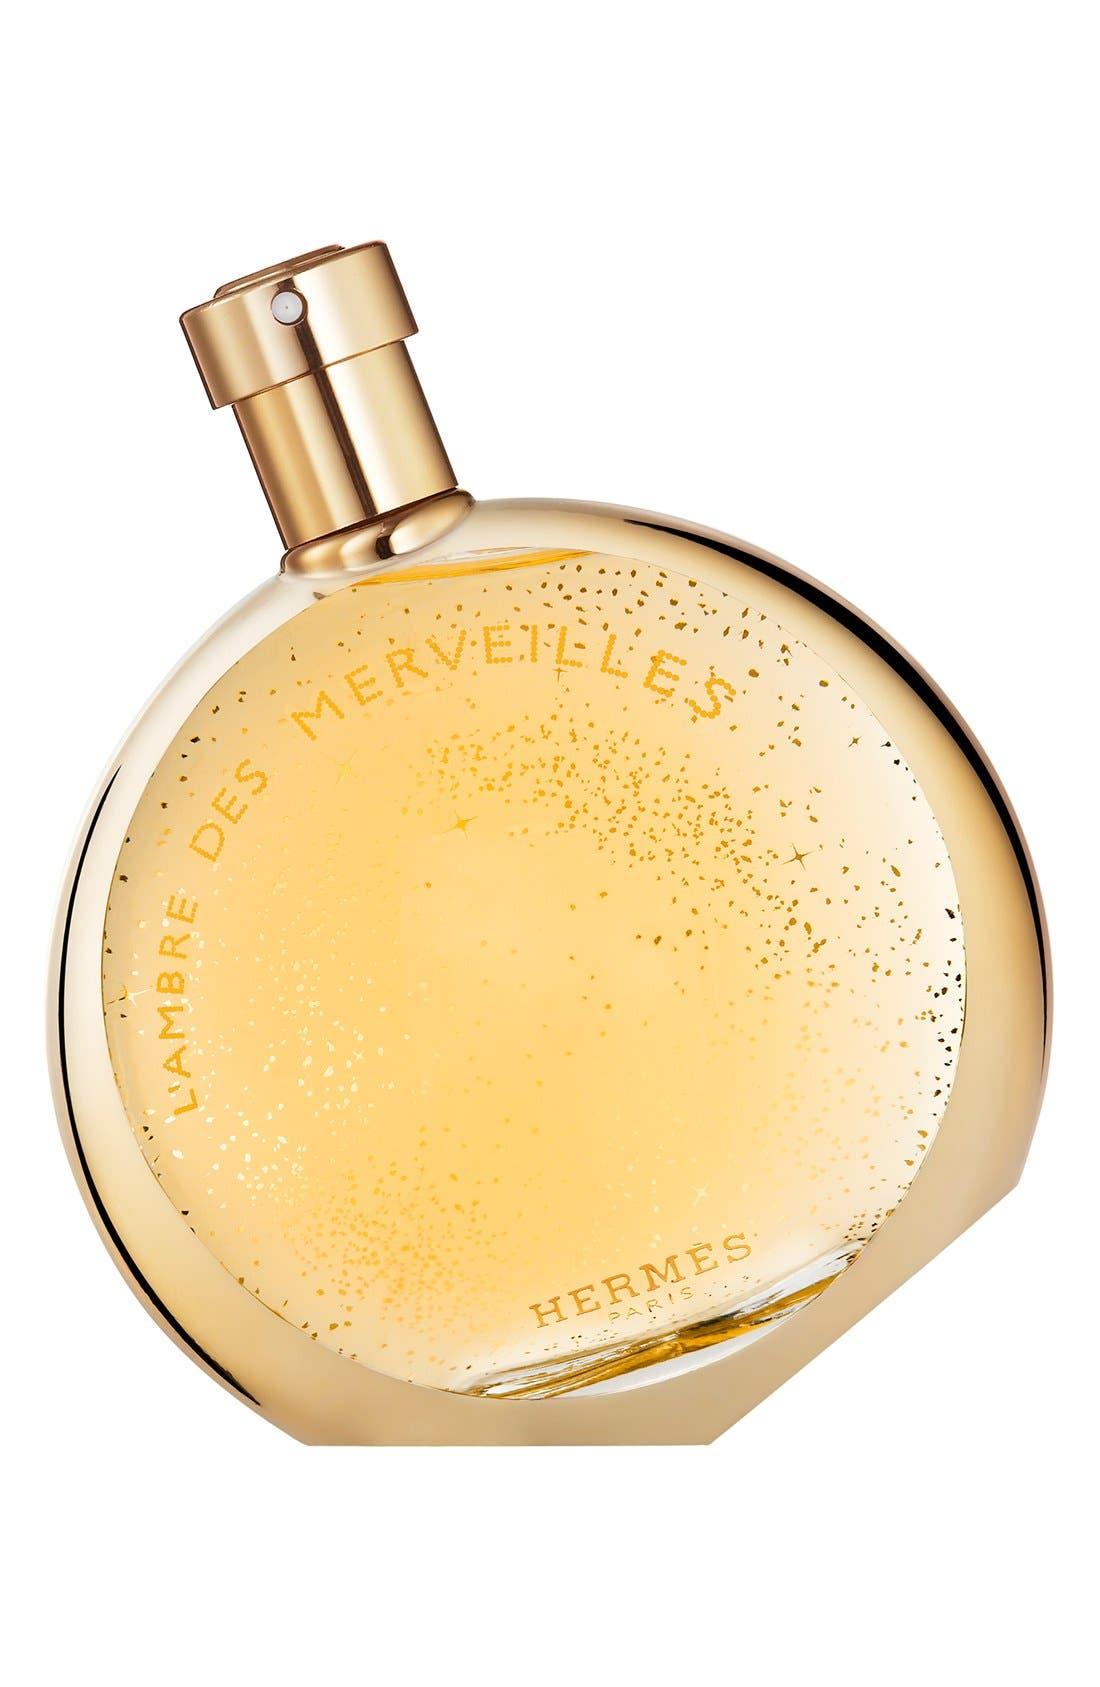 Hermès Eau des Merveilles L'Ambre des Merveilles - Eau de parfum,                         Main,                         color, NO COLOR